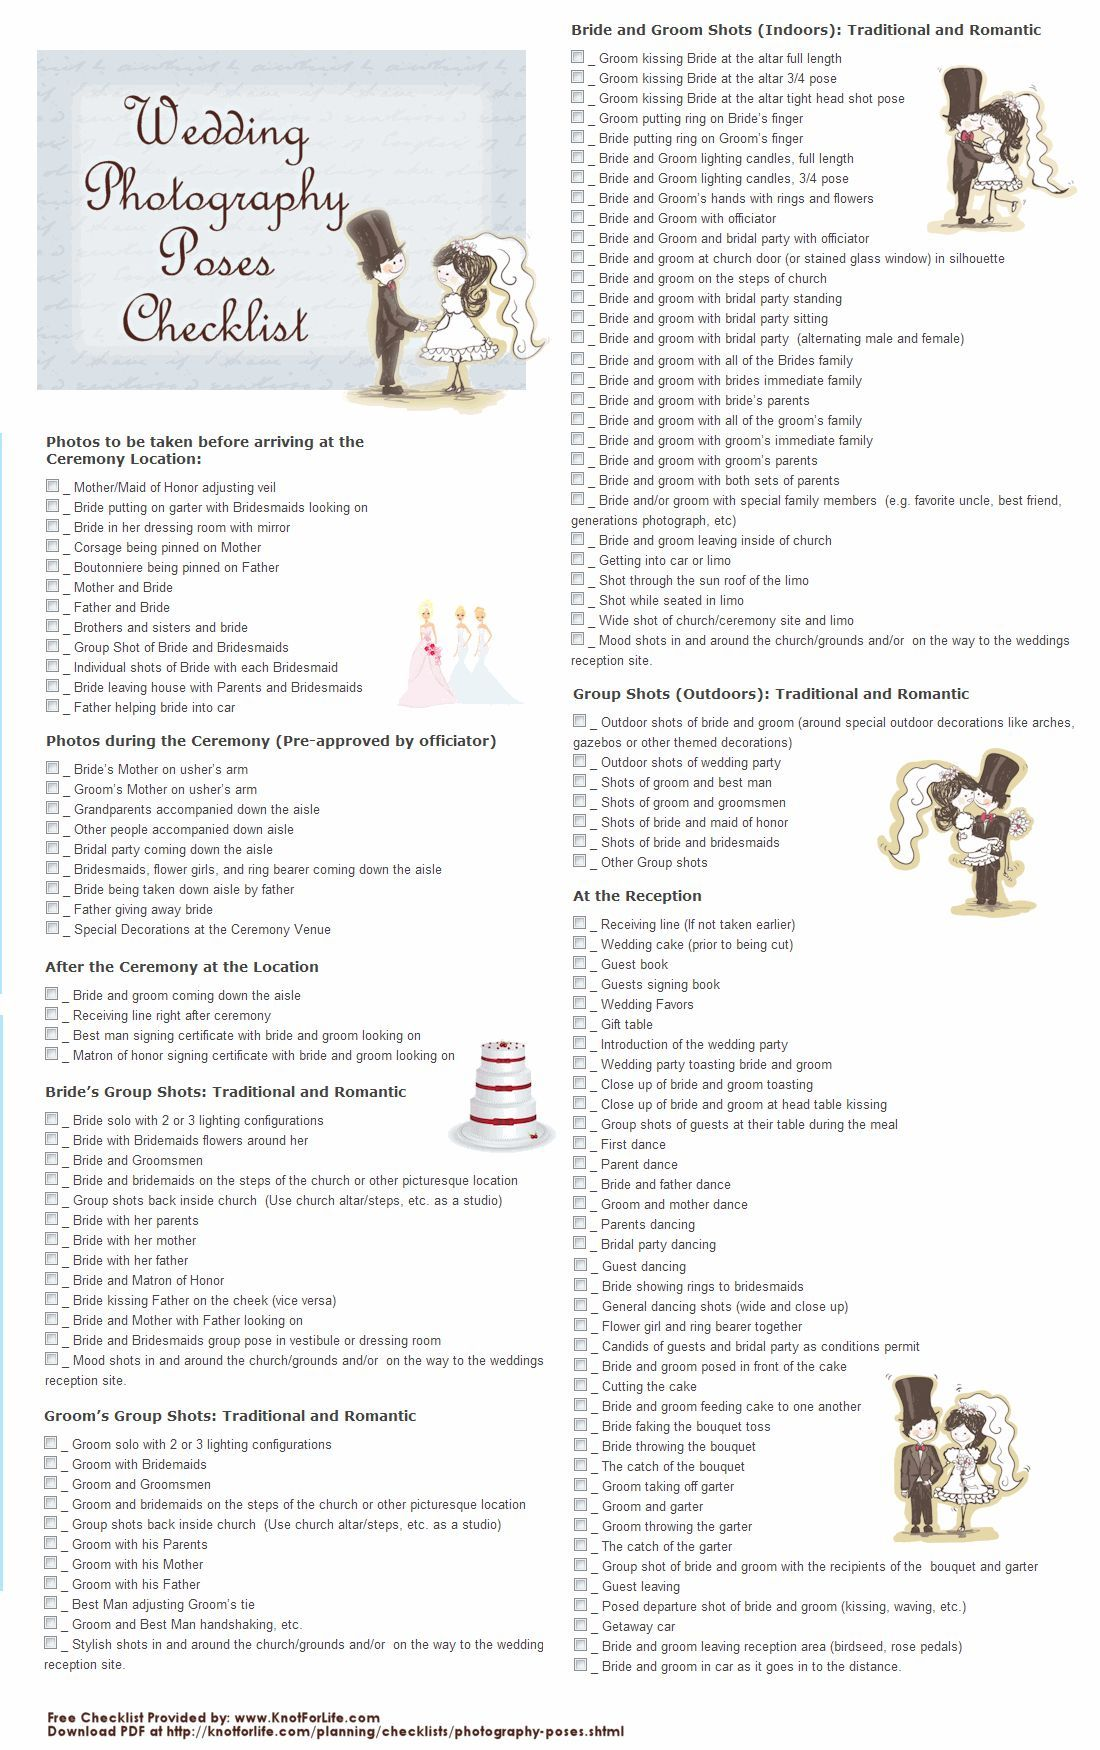 Cool Wedding Photography Checklist Best Photos